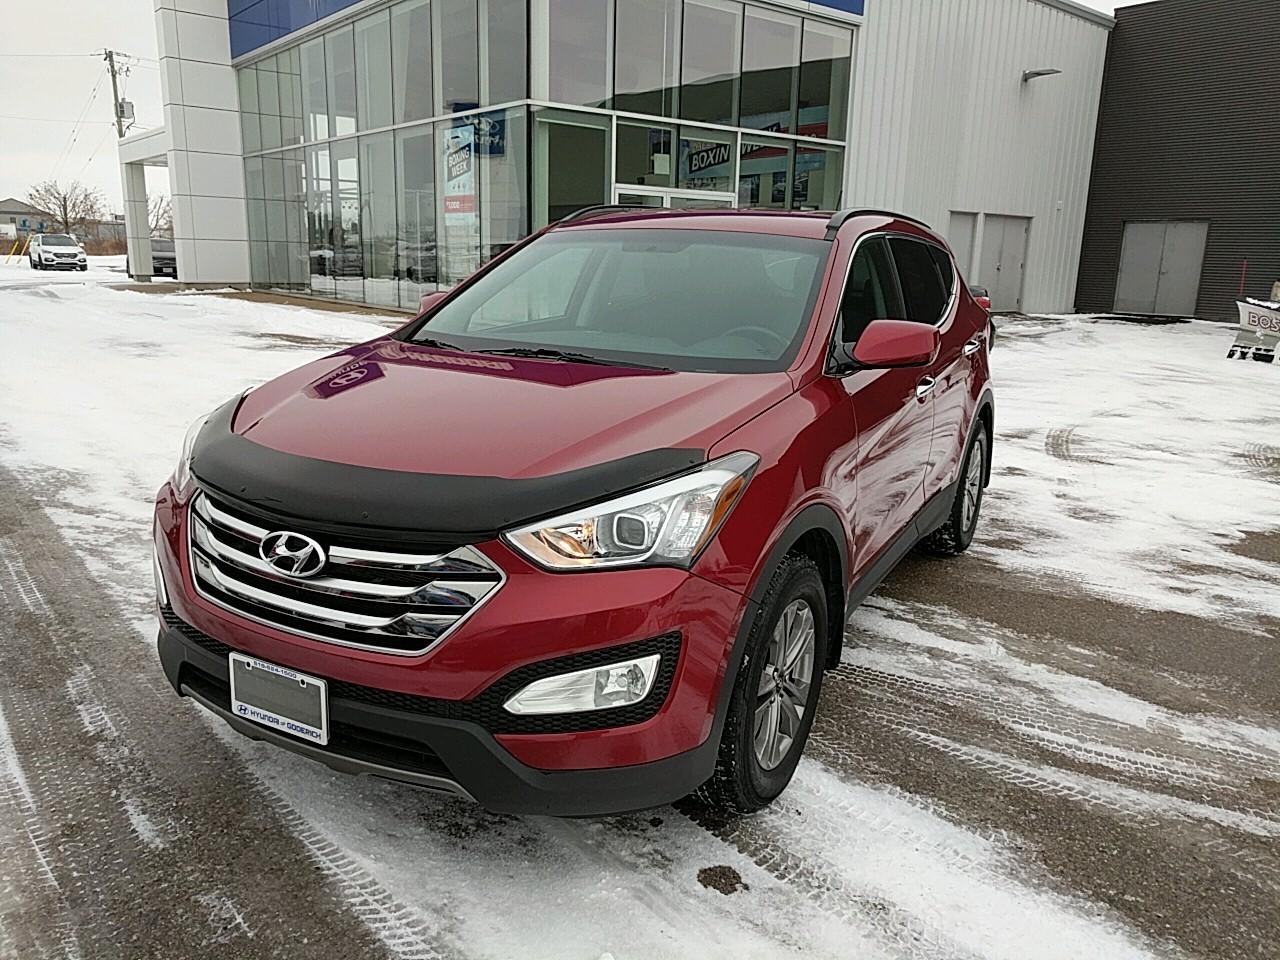 2015 Hyundai Santa Fe Sport 2.4 Premium (Stk: 80043A) in Goderich - Image 1 of 12